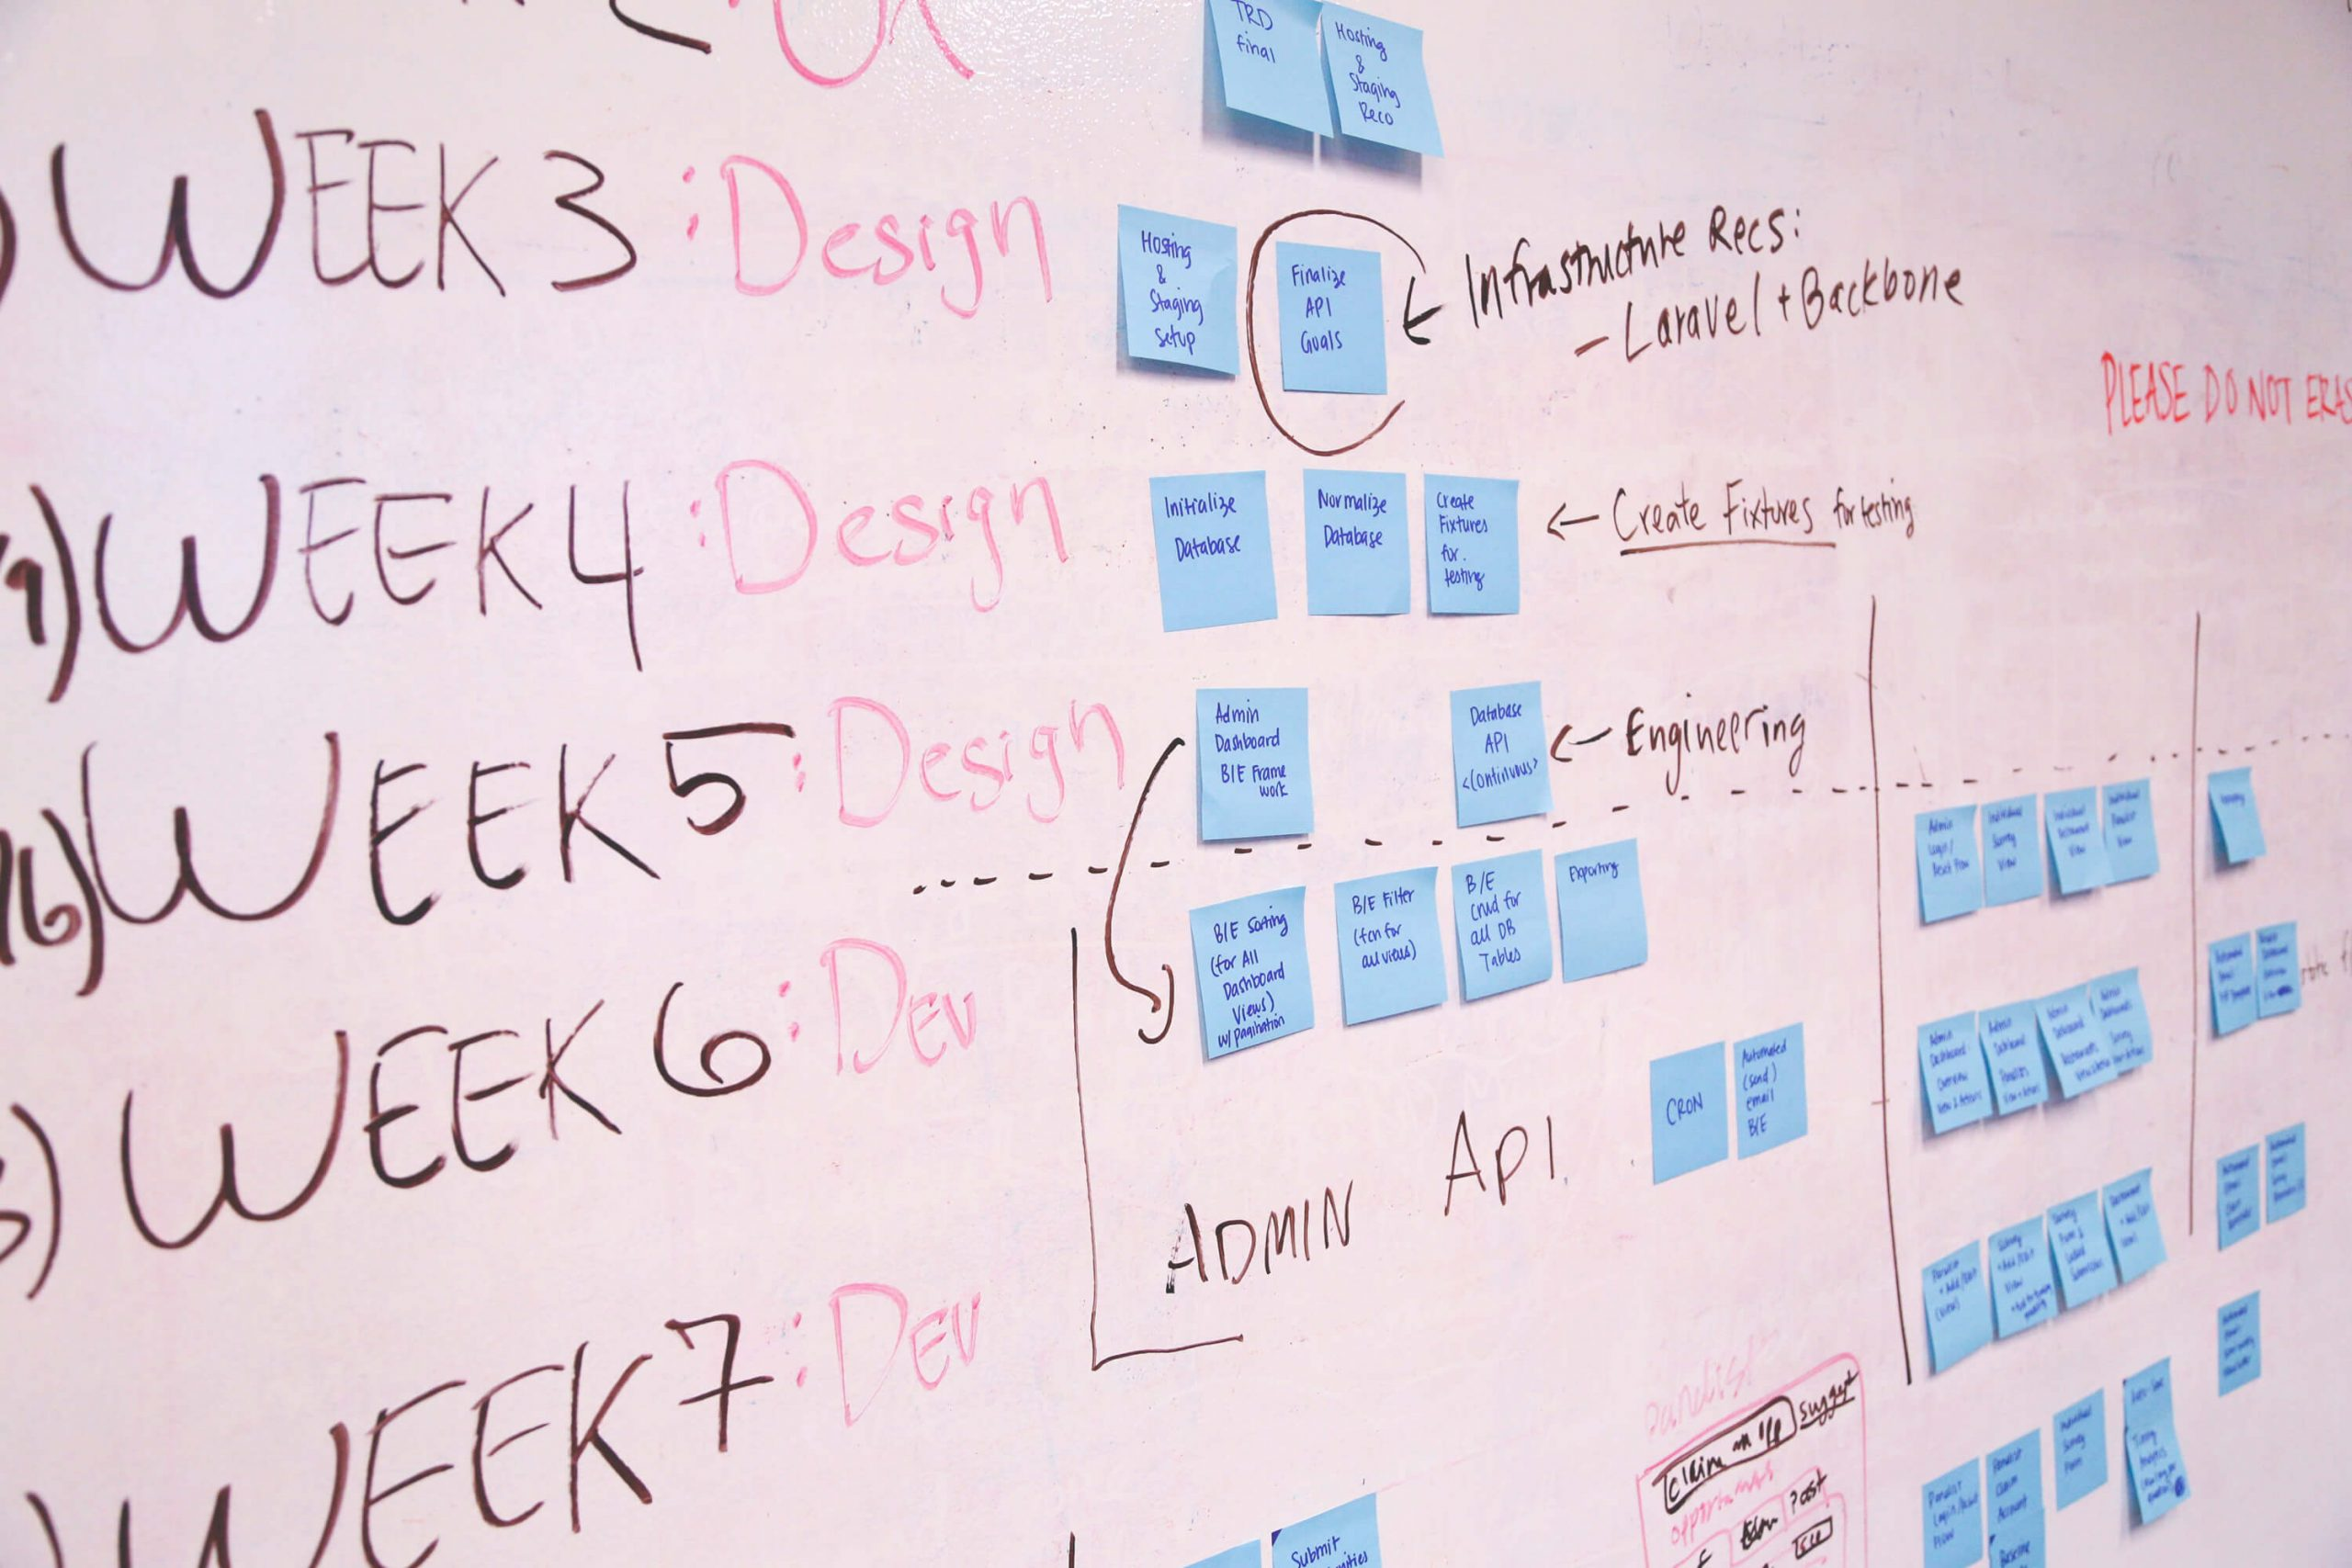 podnikanie-startupy-ako-investovat